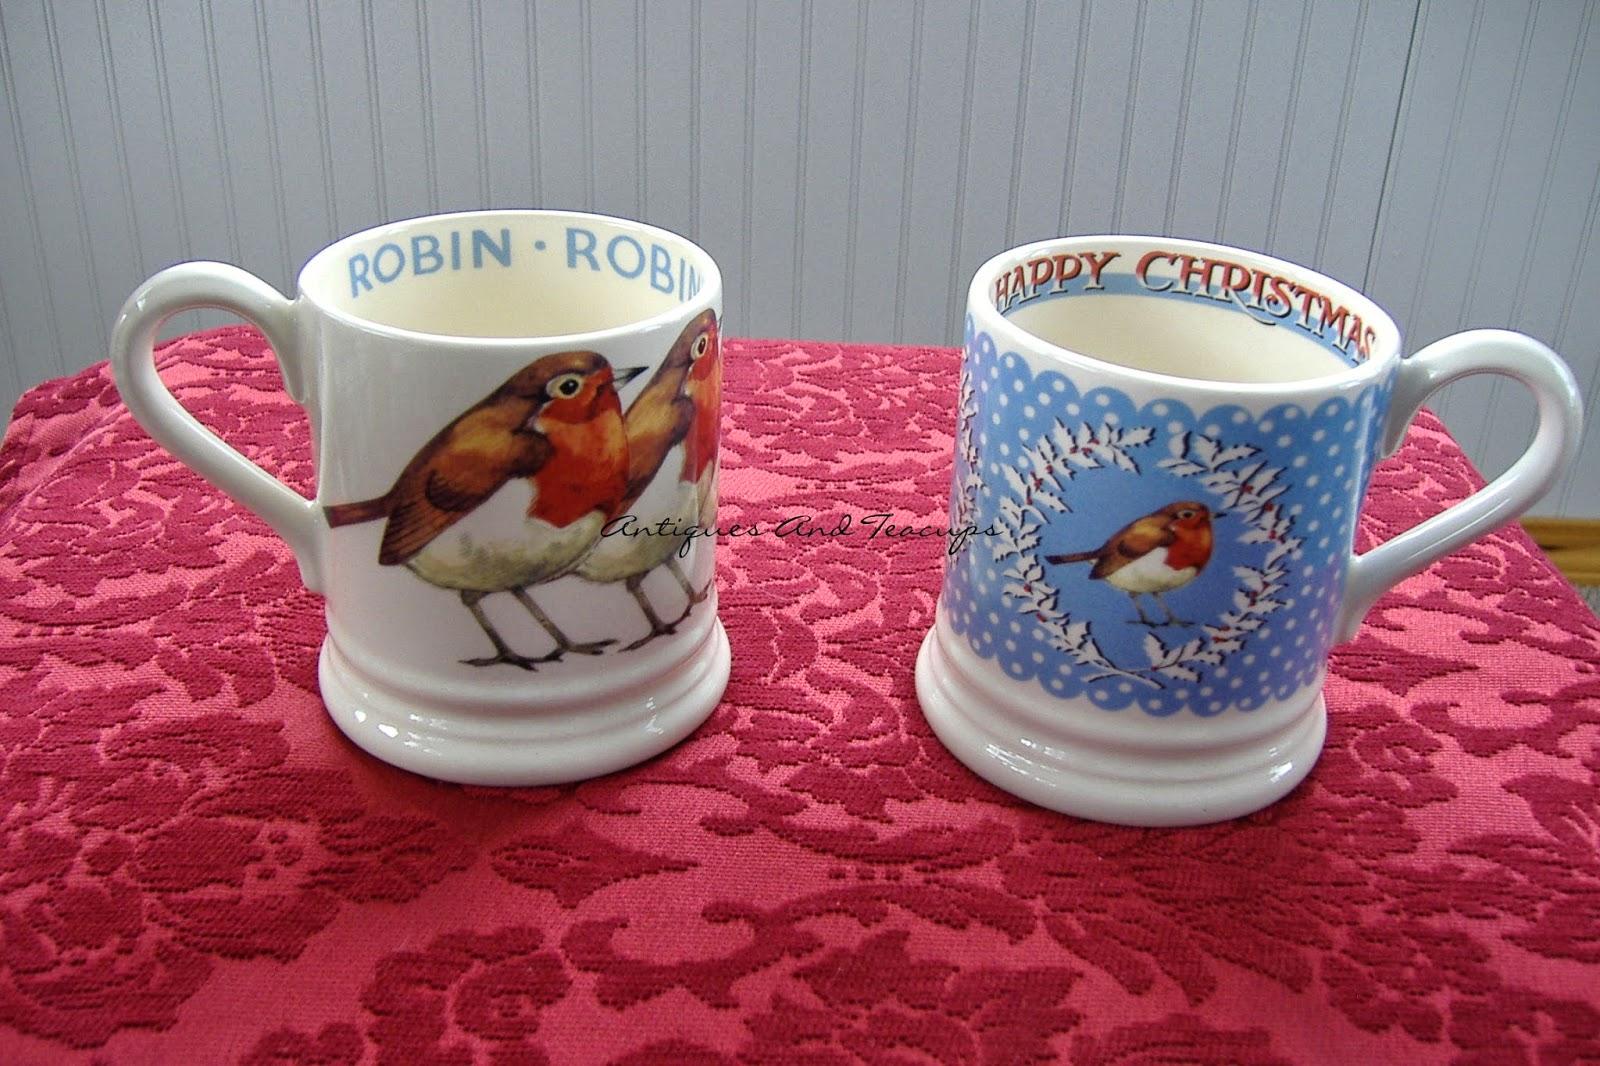 Antiques And Teacups: Tuesday Cuppa Tea, English Robins ...